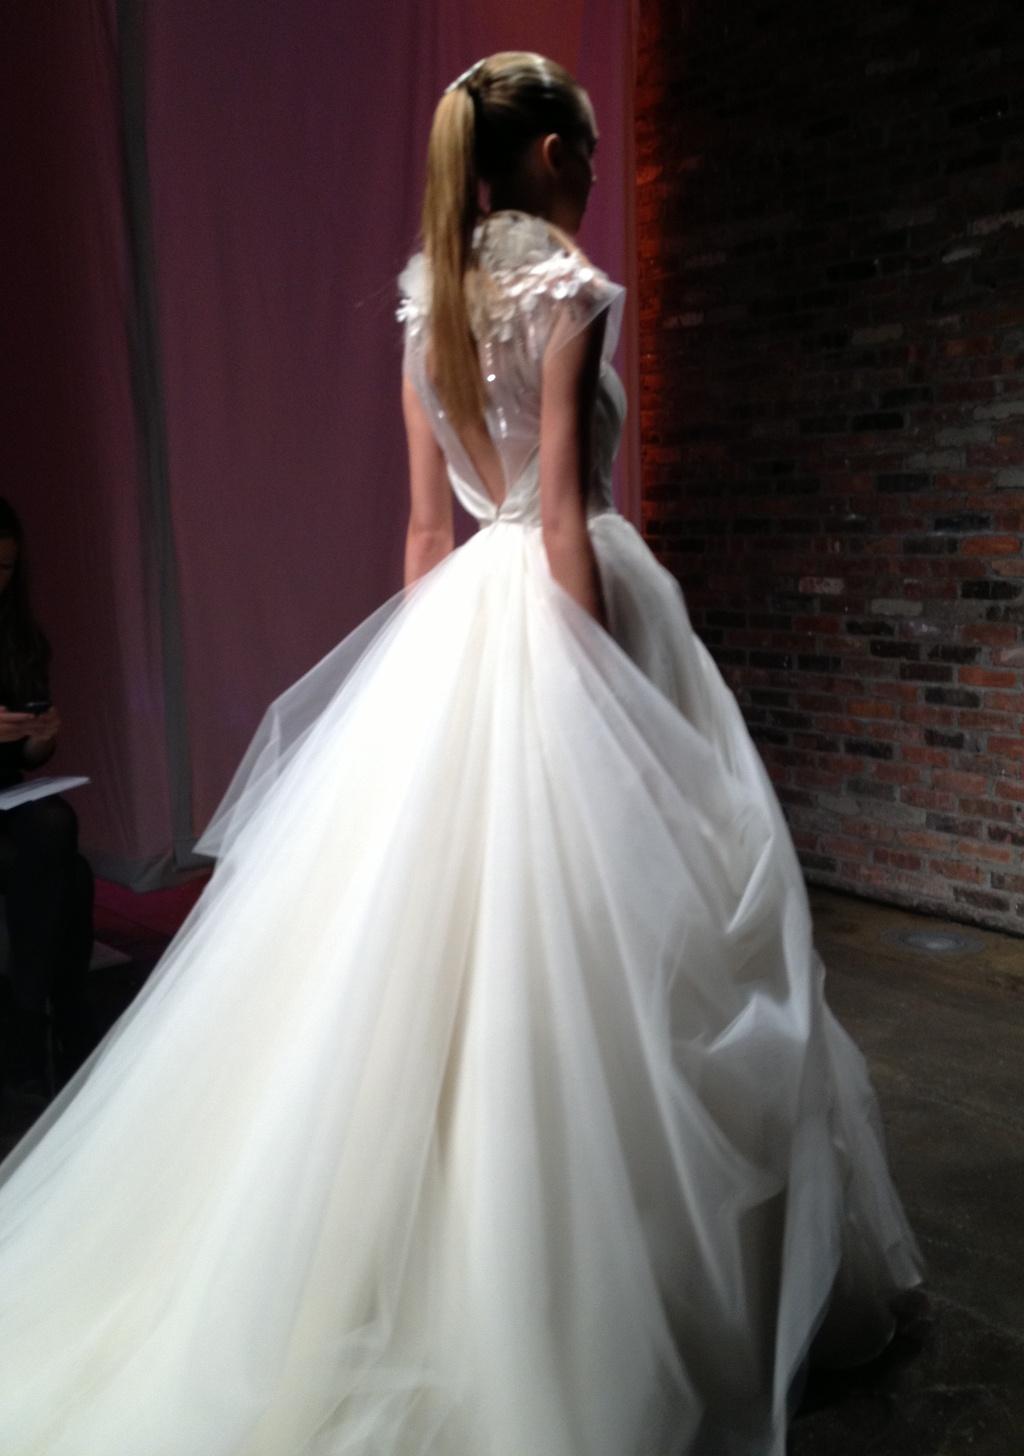 Spring-2013-wedding-dress-alvina-valenta-2.full